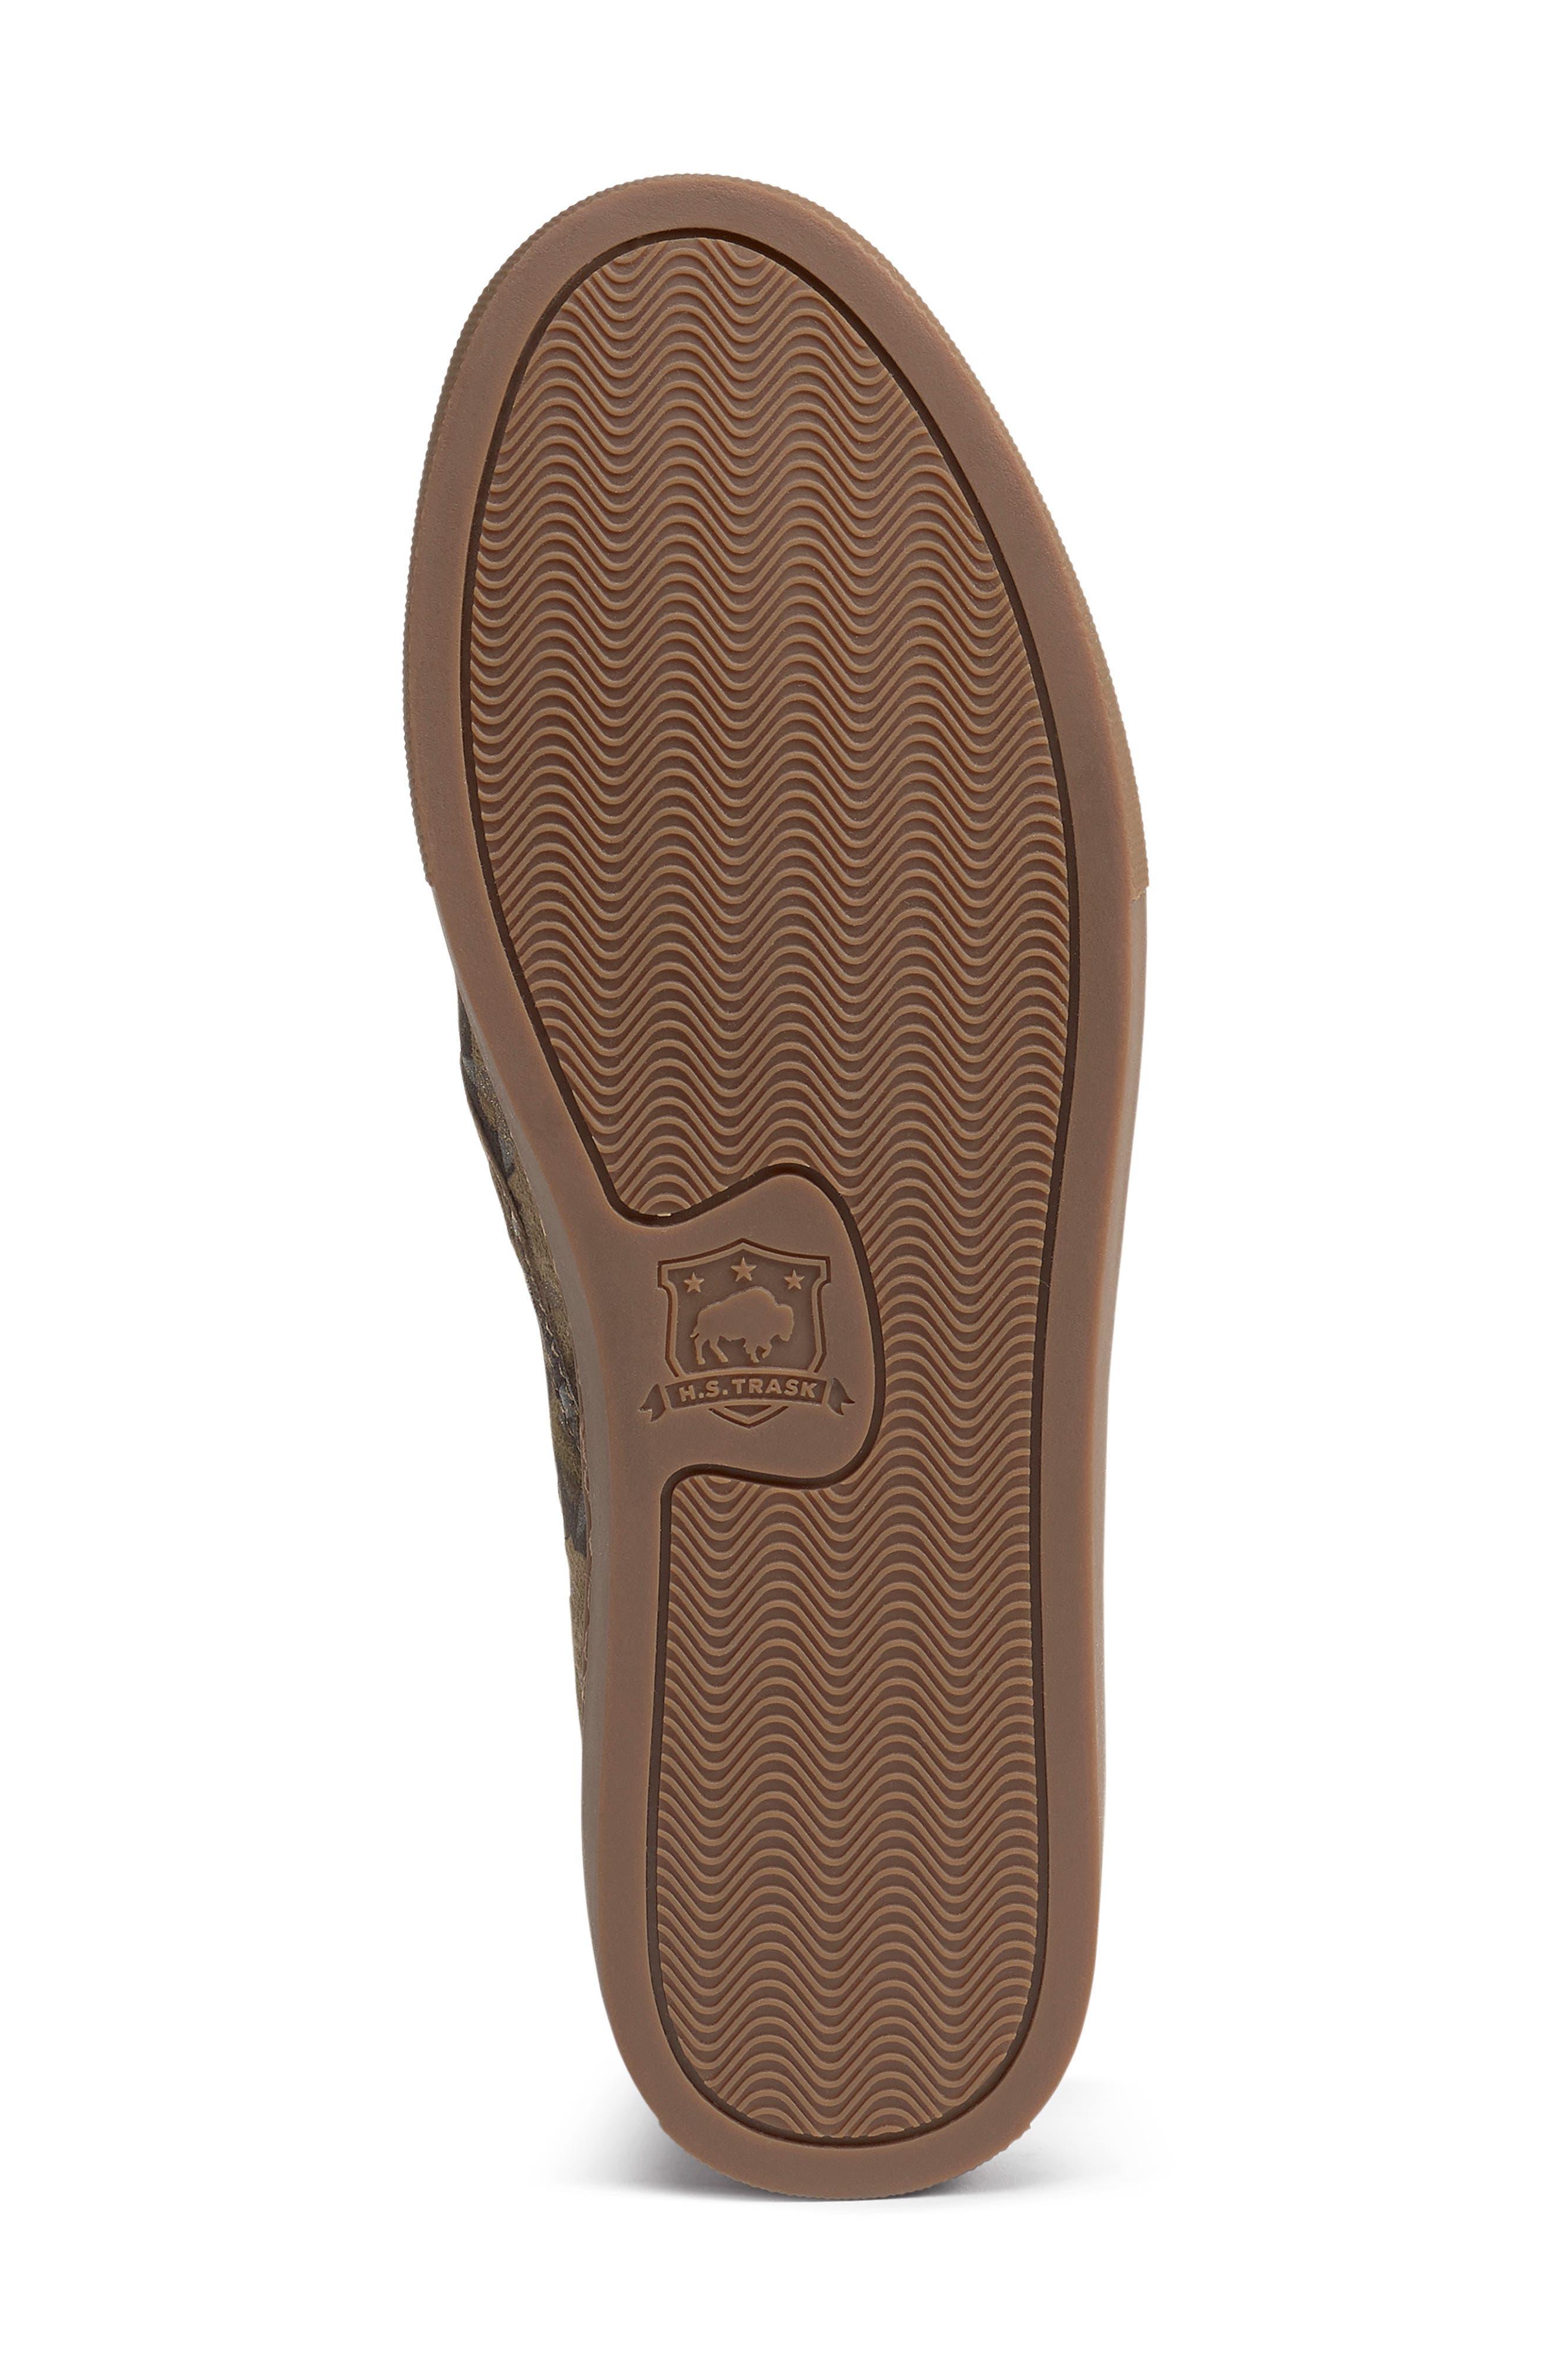 Lillian Water Resistant Slip-On Sneaker,                             Alternate thumbnail 6, color,                             OLIVE STAR PRINT SUEDE